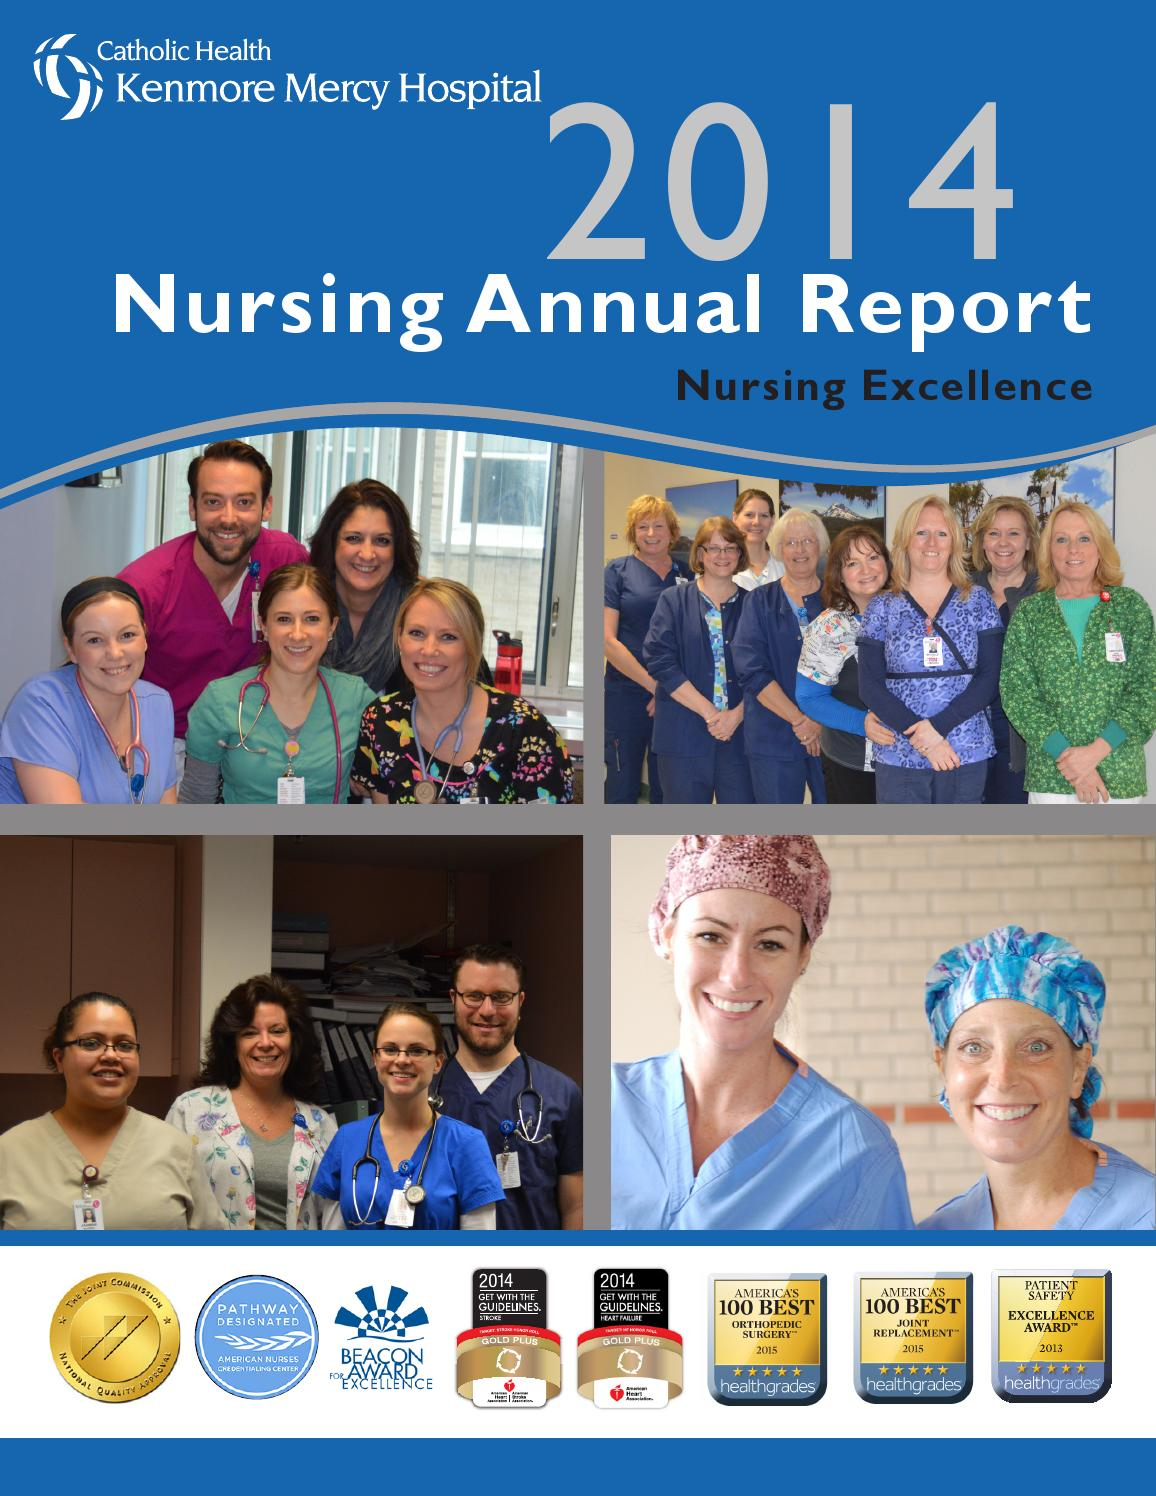 Kenmore Mercy Hospital - 2014 Nursing Annual Report by Catholic